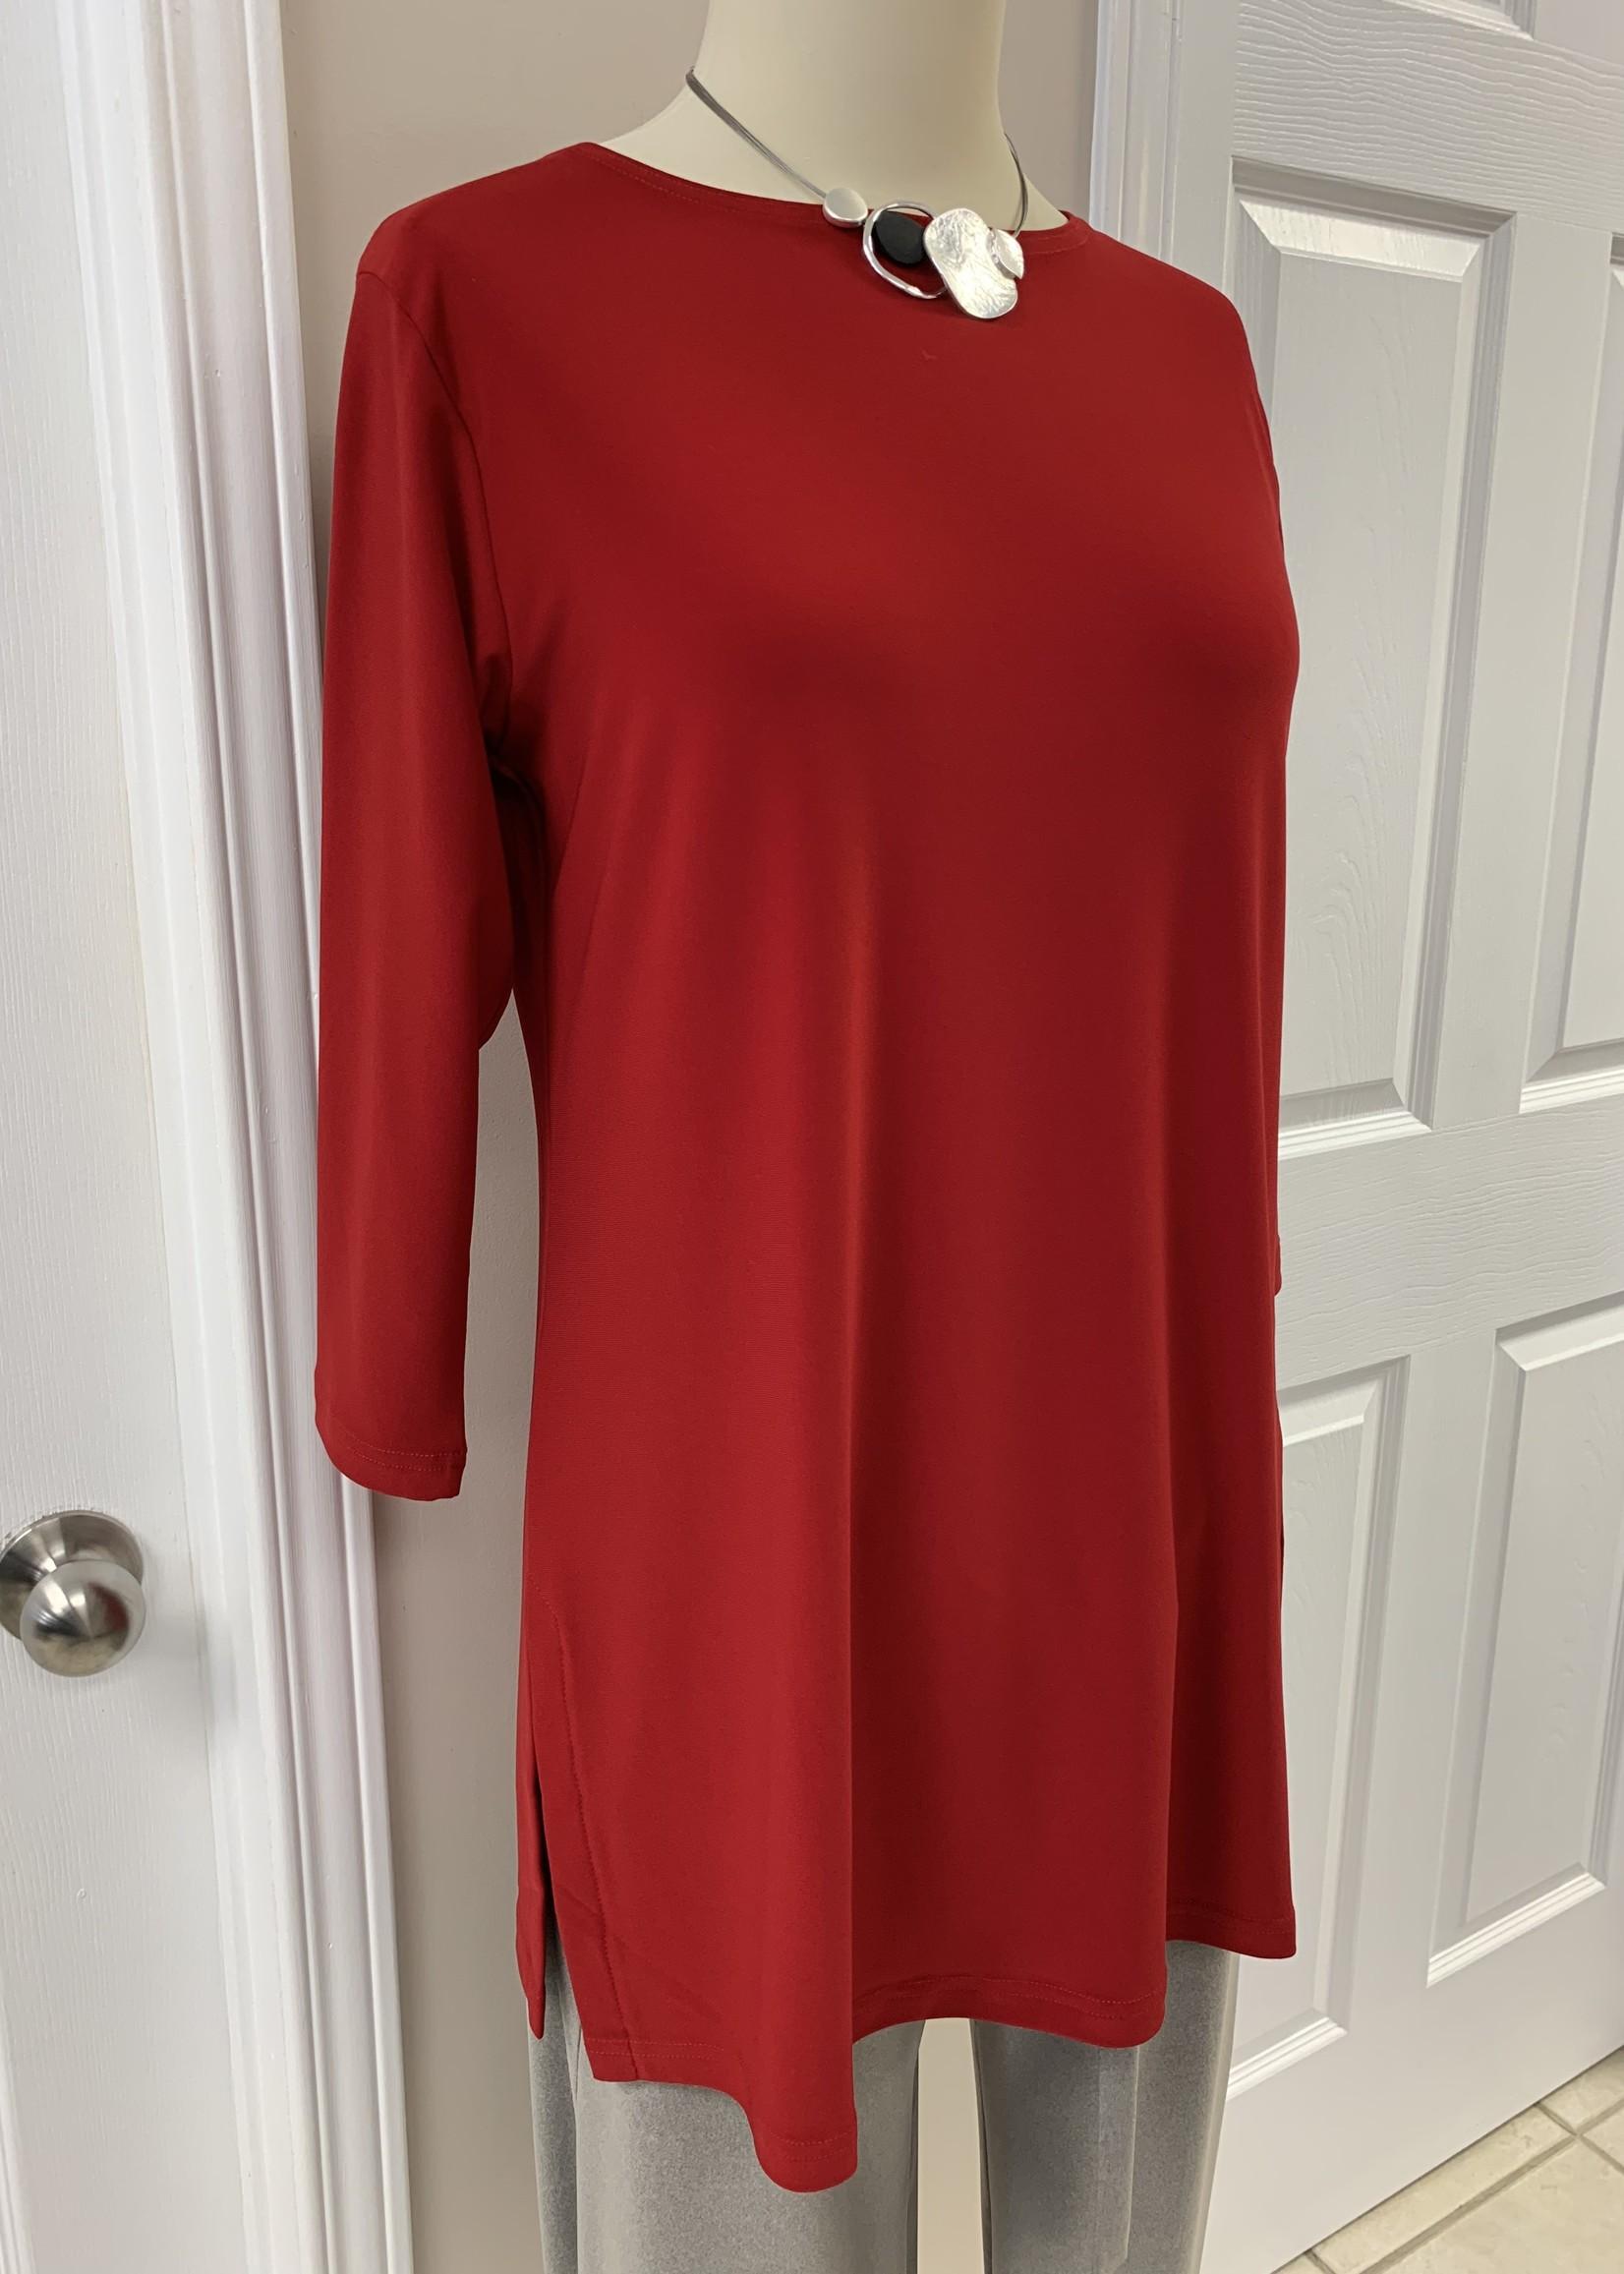 Sympli Sympli Nu Ideal Tunic 3/4 Sleeve Red